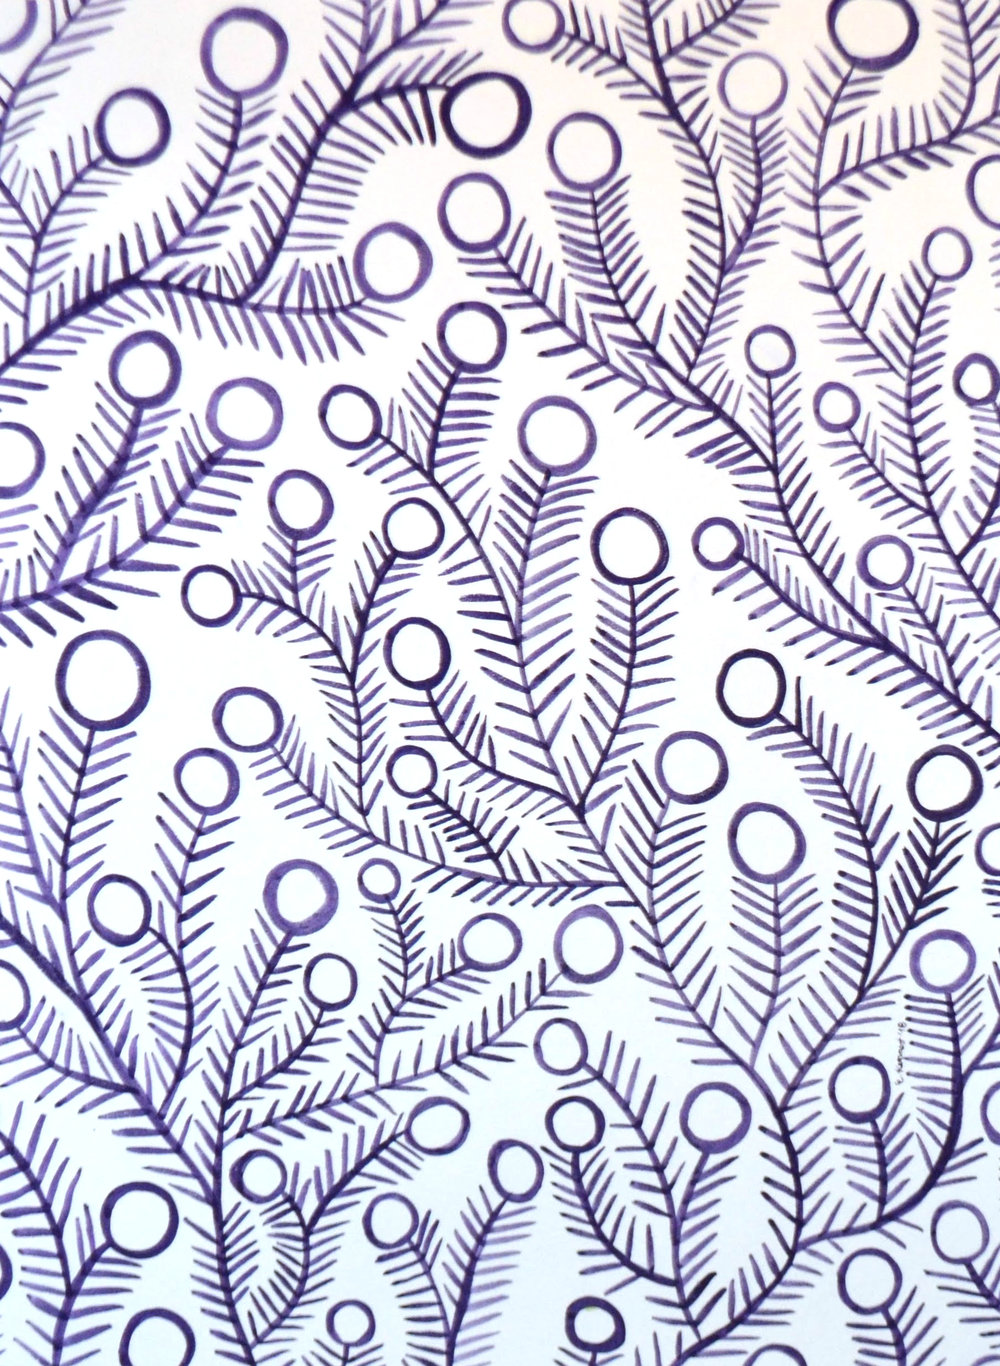 purple white.jpg